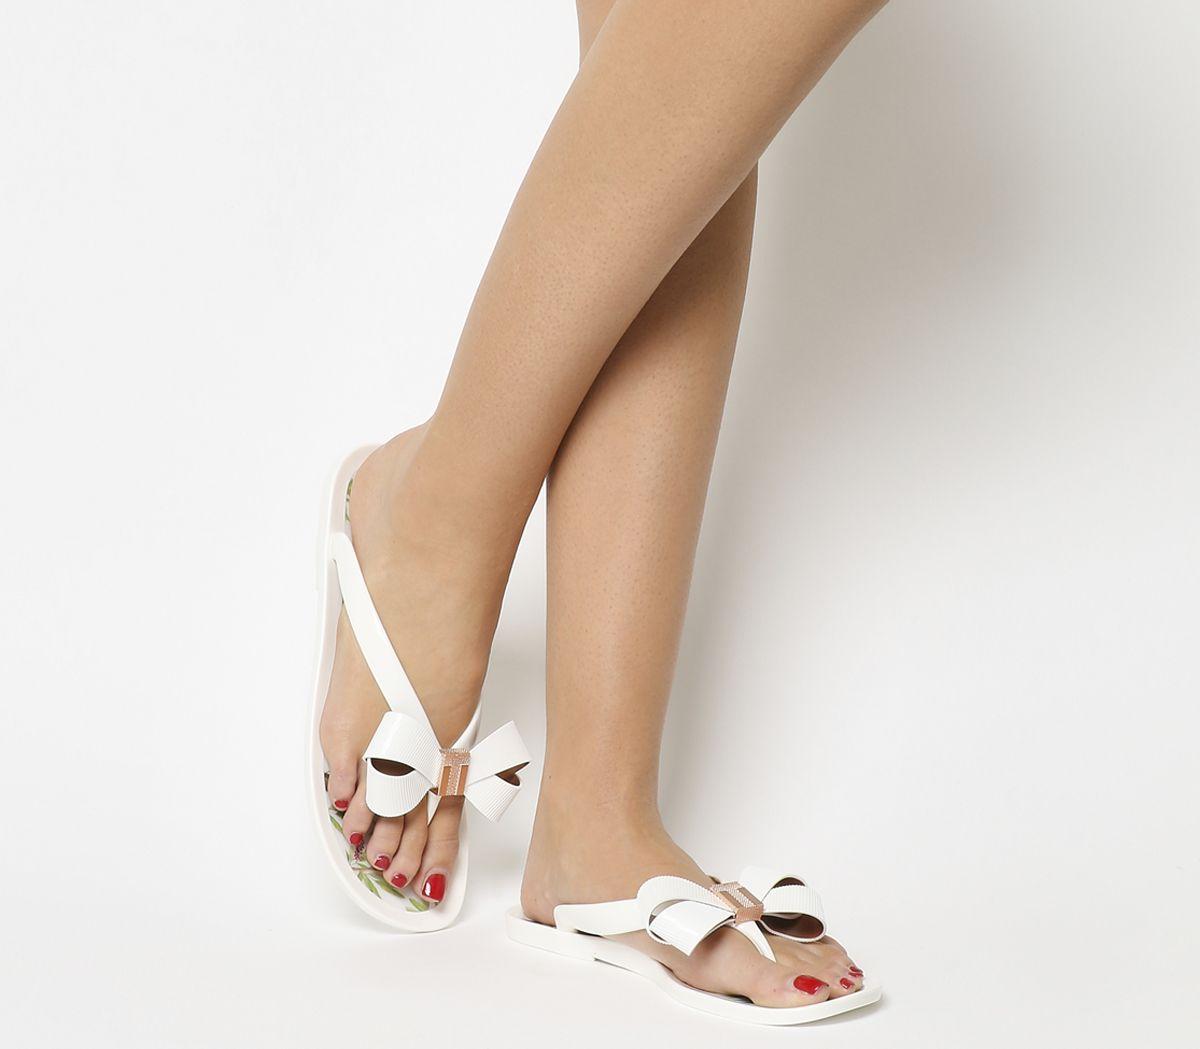 09d948cbcab0 Ted Baker Susziep Flip Flop Sandals Highgrove Hummingbird - Sandals